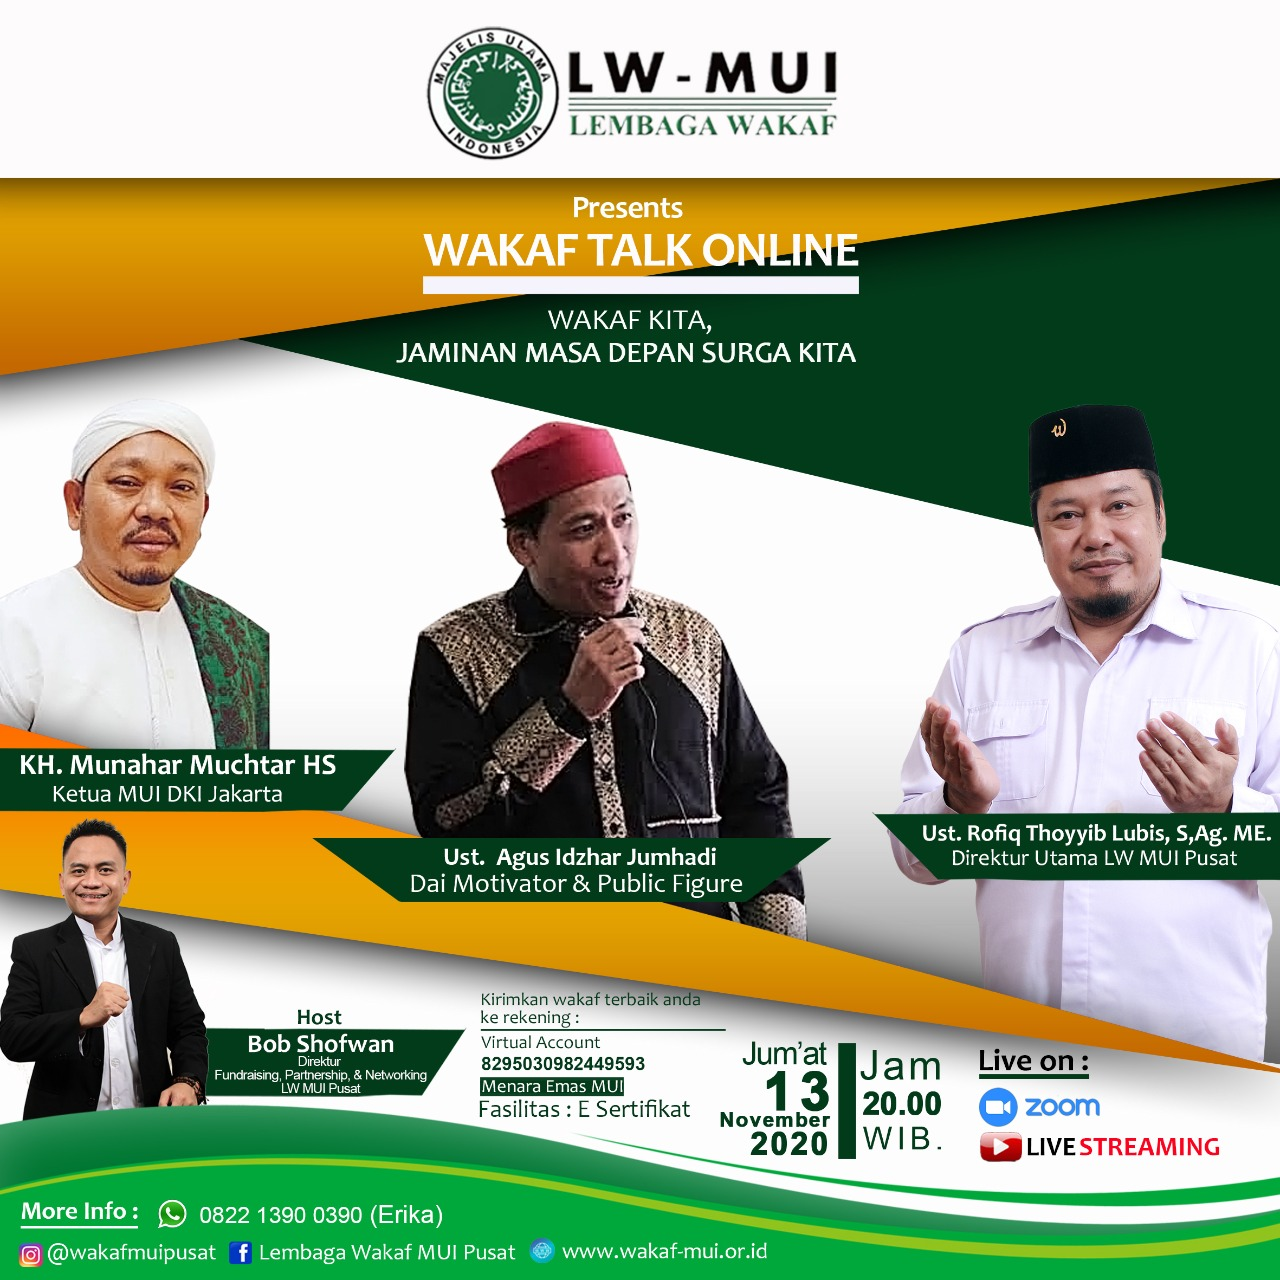 Wakaf Talk Online - Wakaf Kita, Jaminan Masa Depan Surga Kita